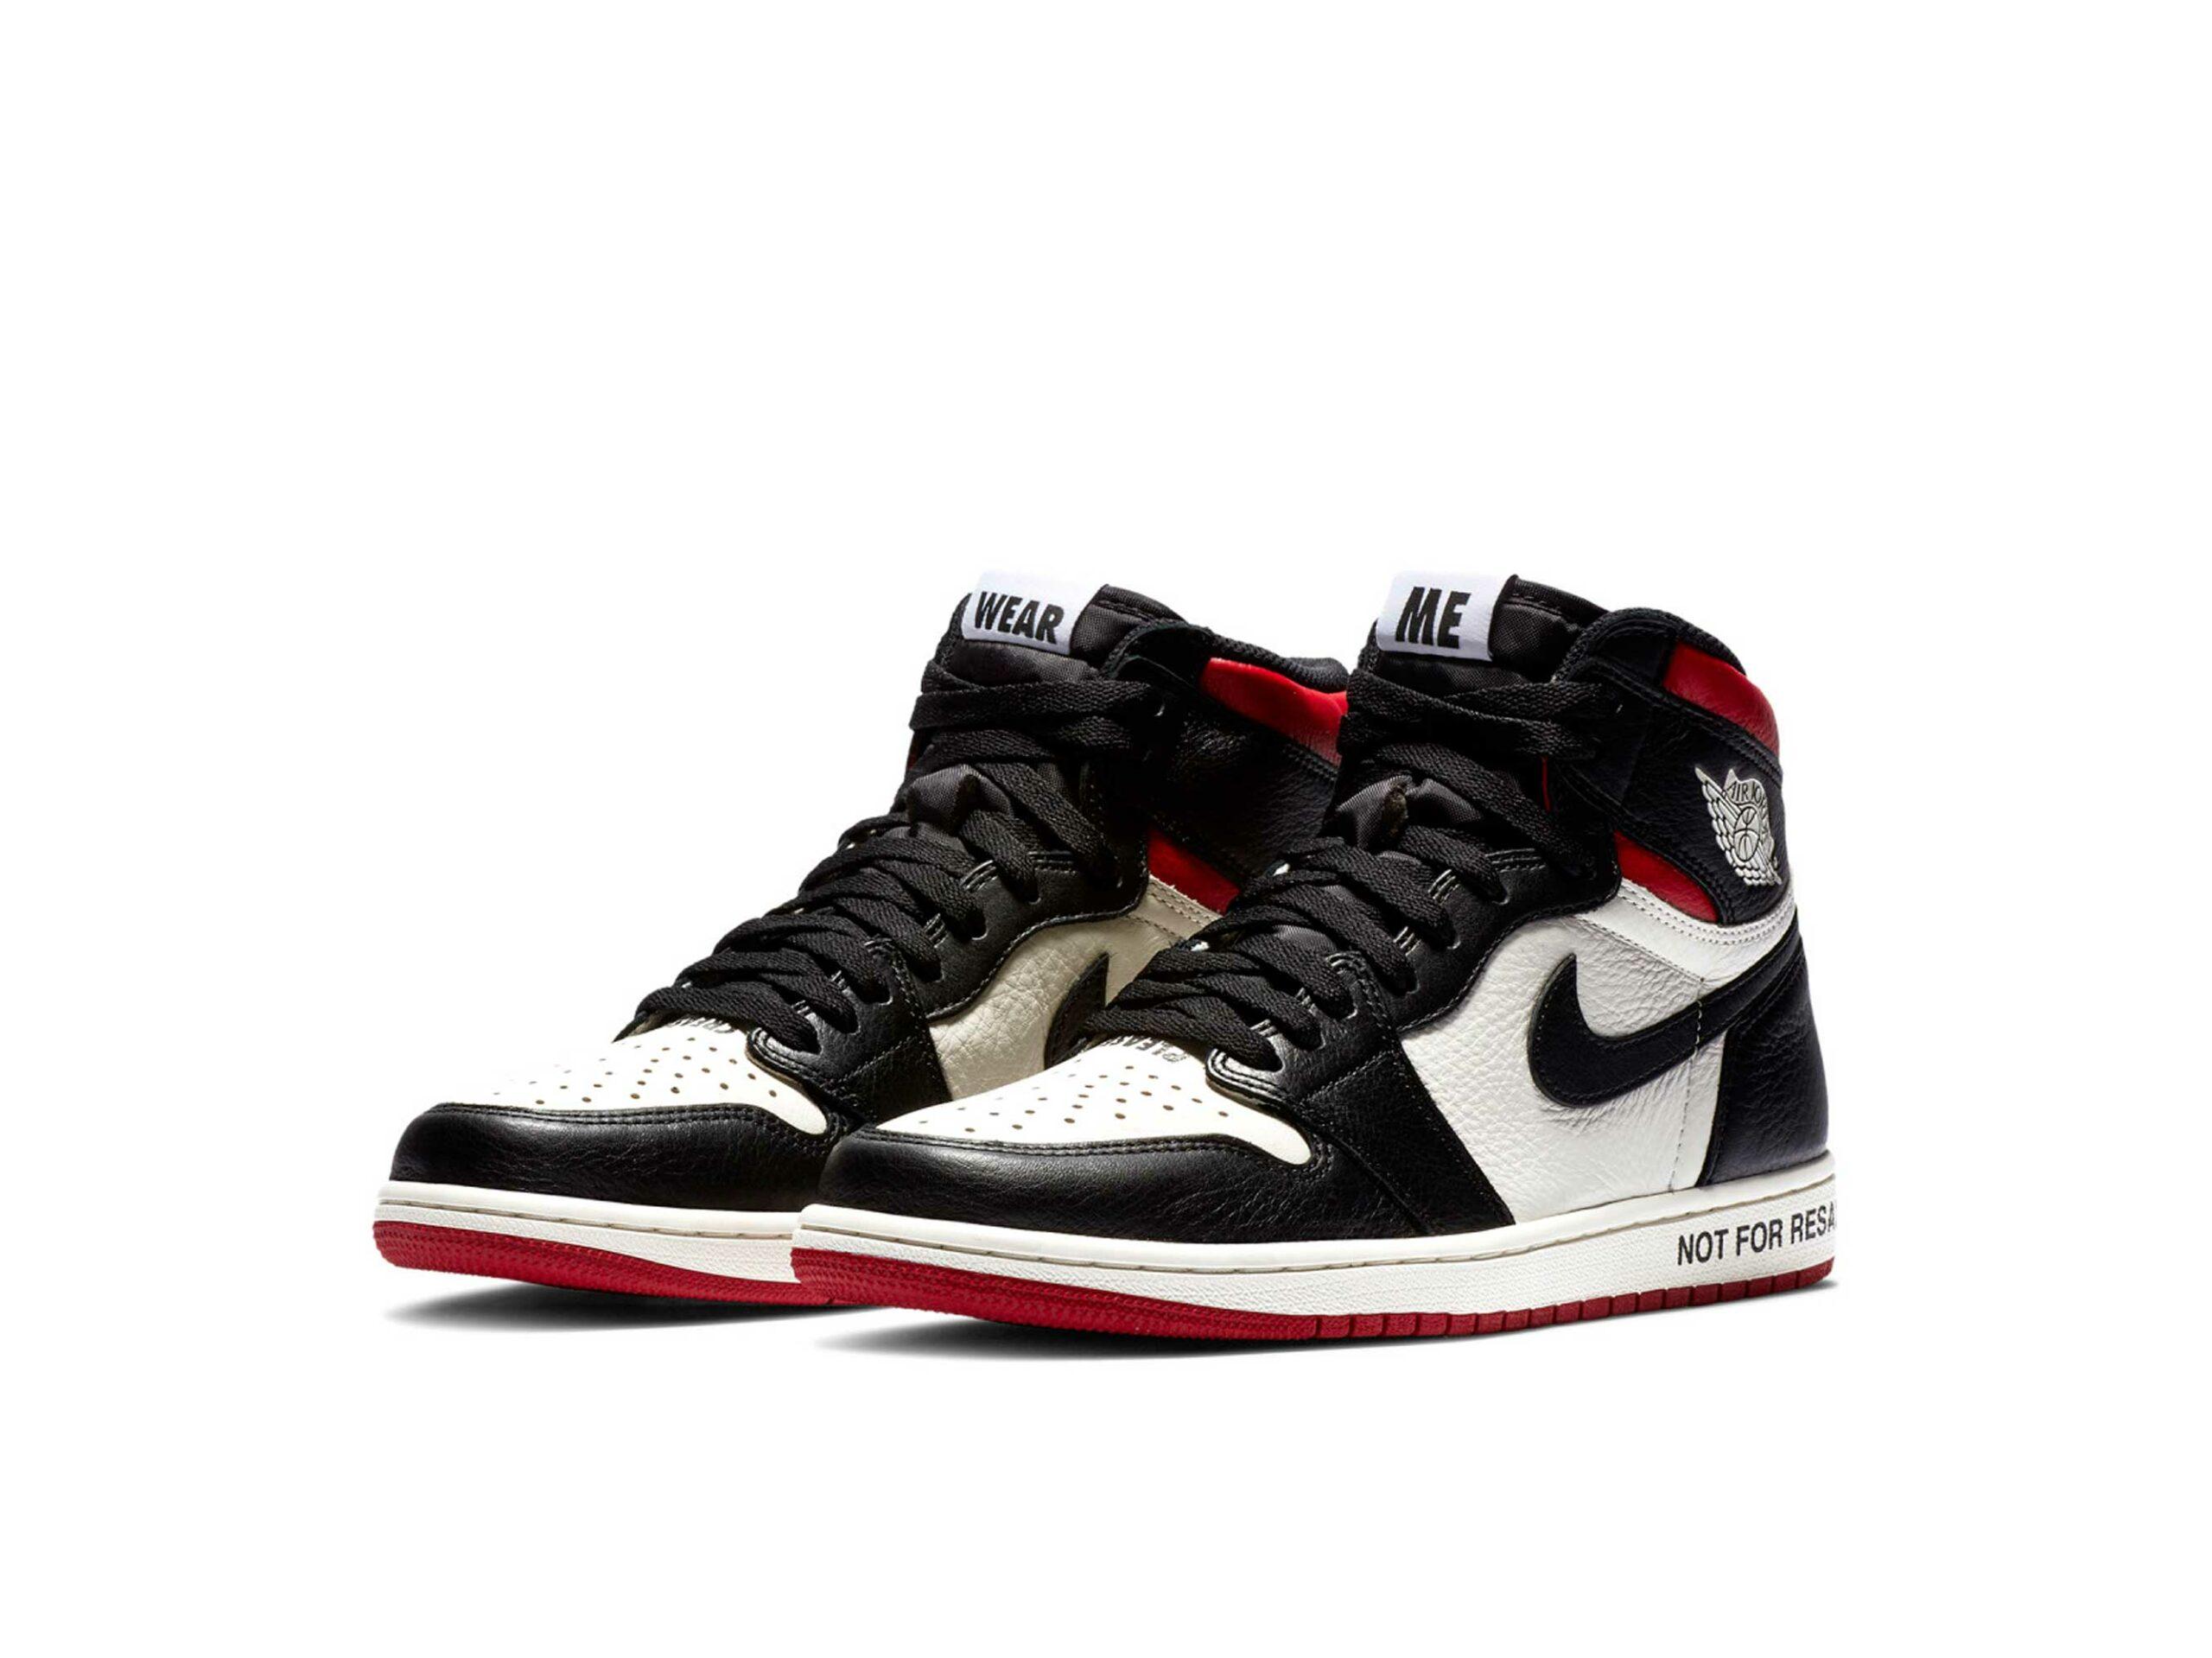 nike air Jordan 1 high og not for resale 861428_106 купить